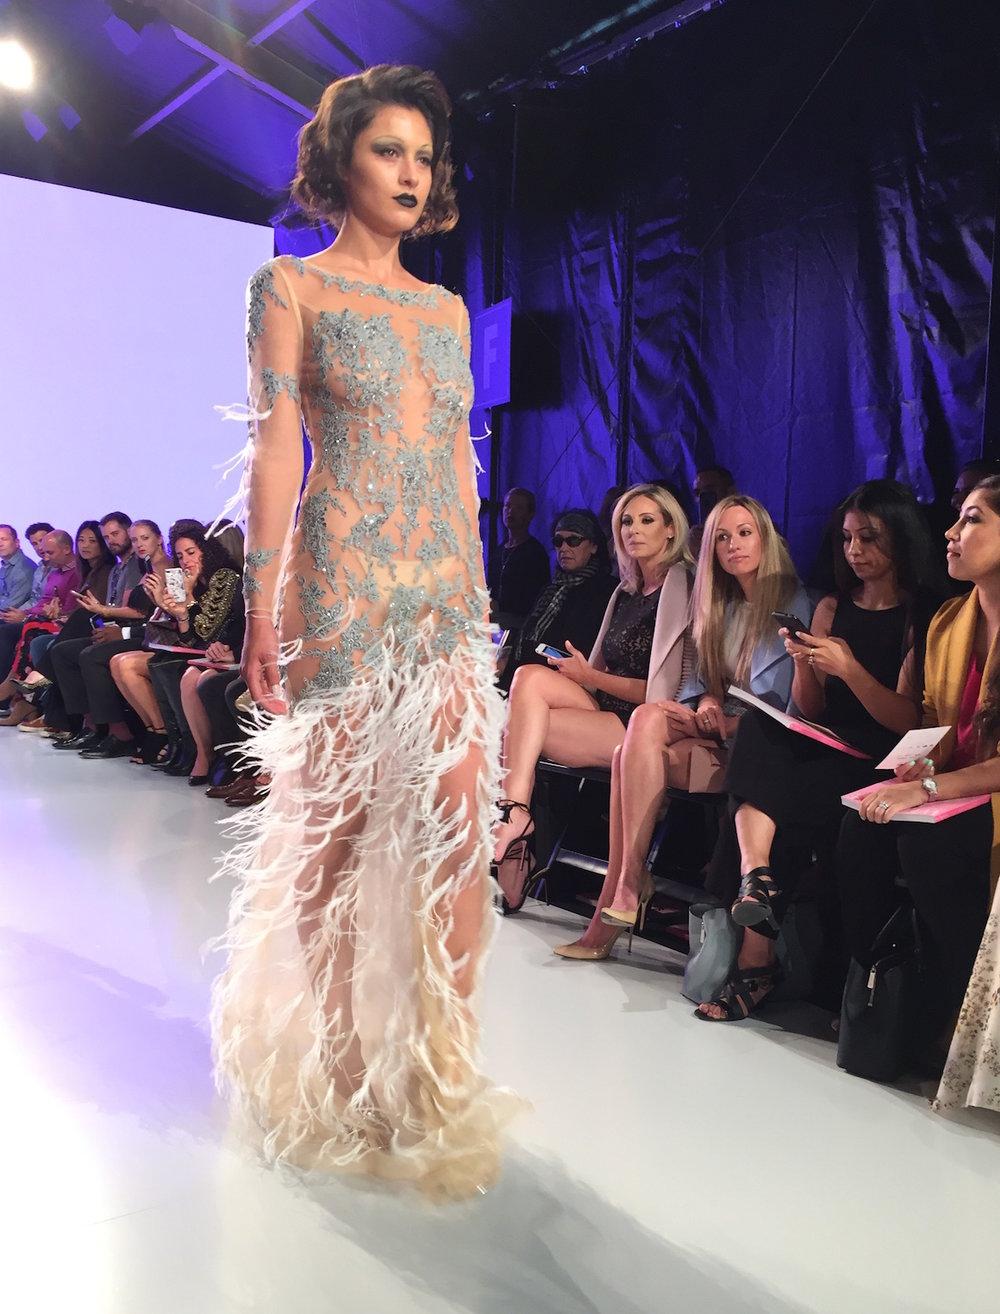 Narces-Toronto-Fashion-Week-TFW-SS18-3.JPG